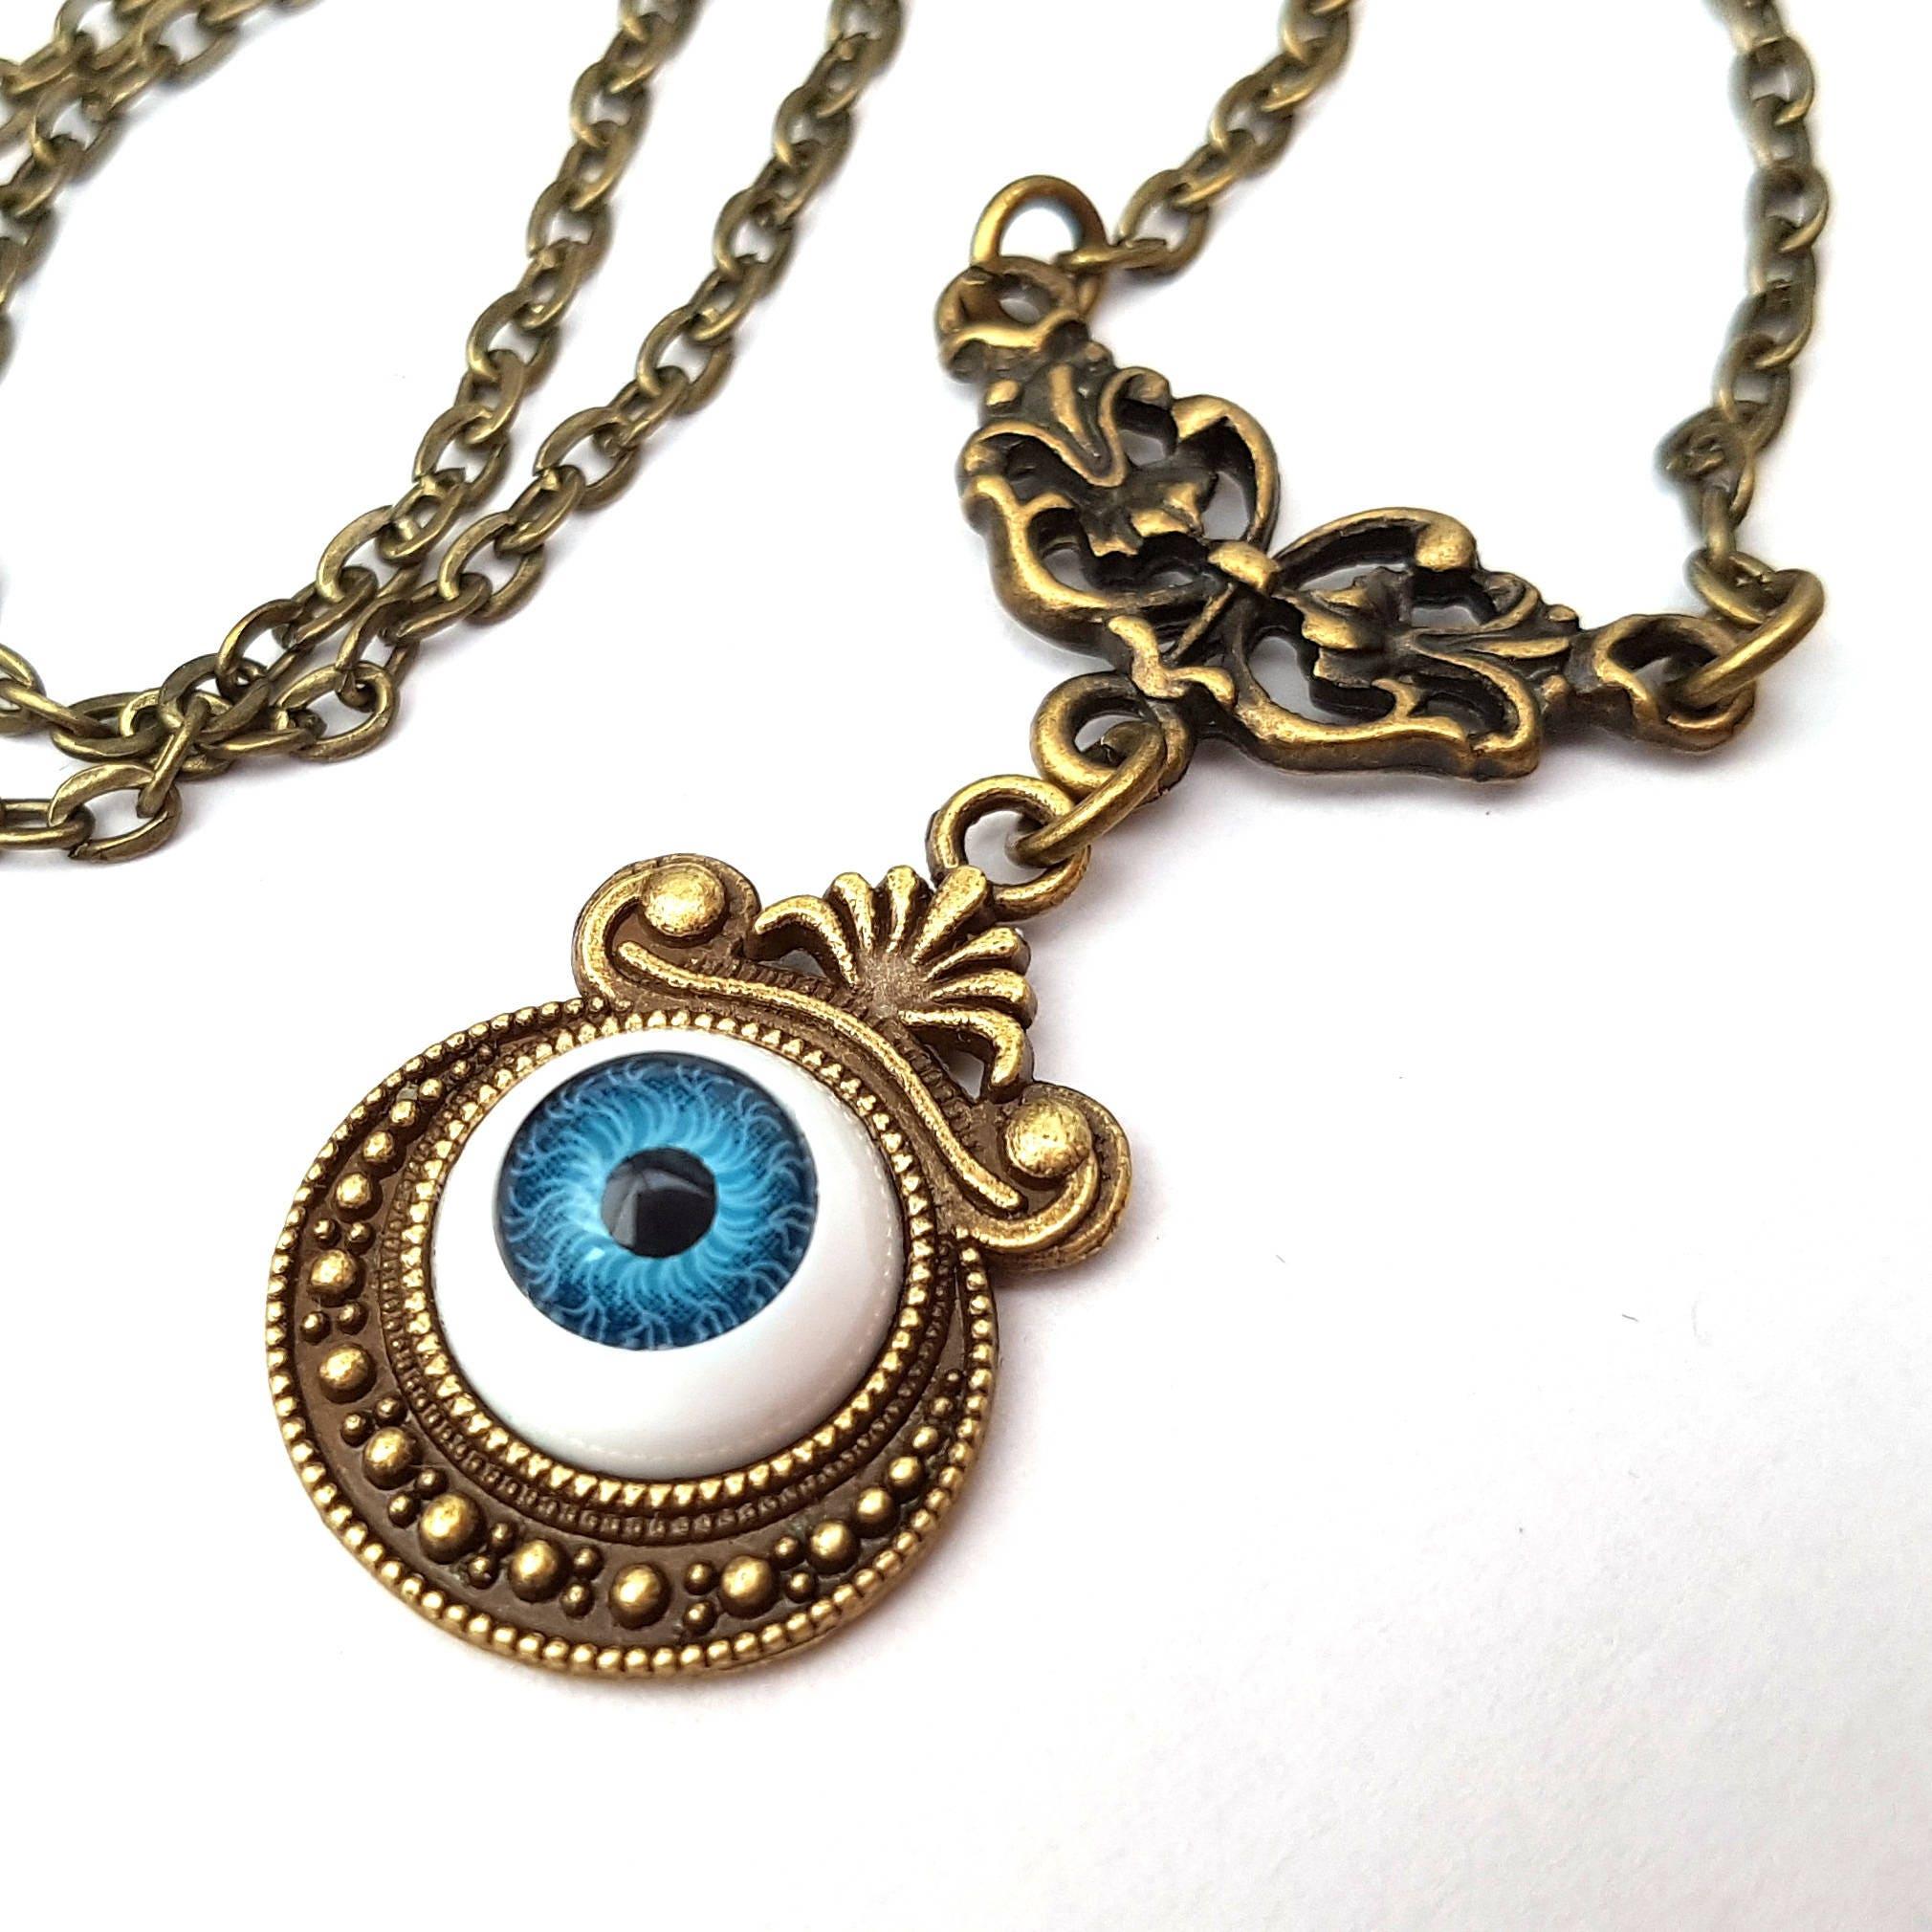 Ive Got My Eye On You Blue Eye Necklace Spooky Evil Eye Eyeball Necklace Antique Bronze